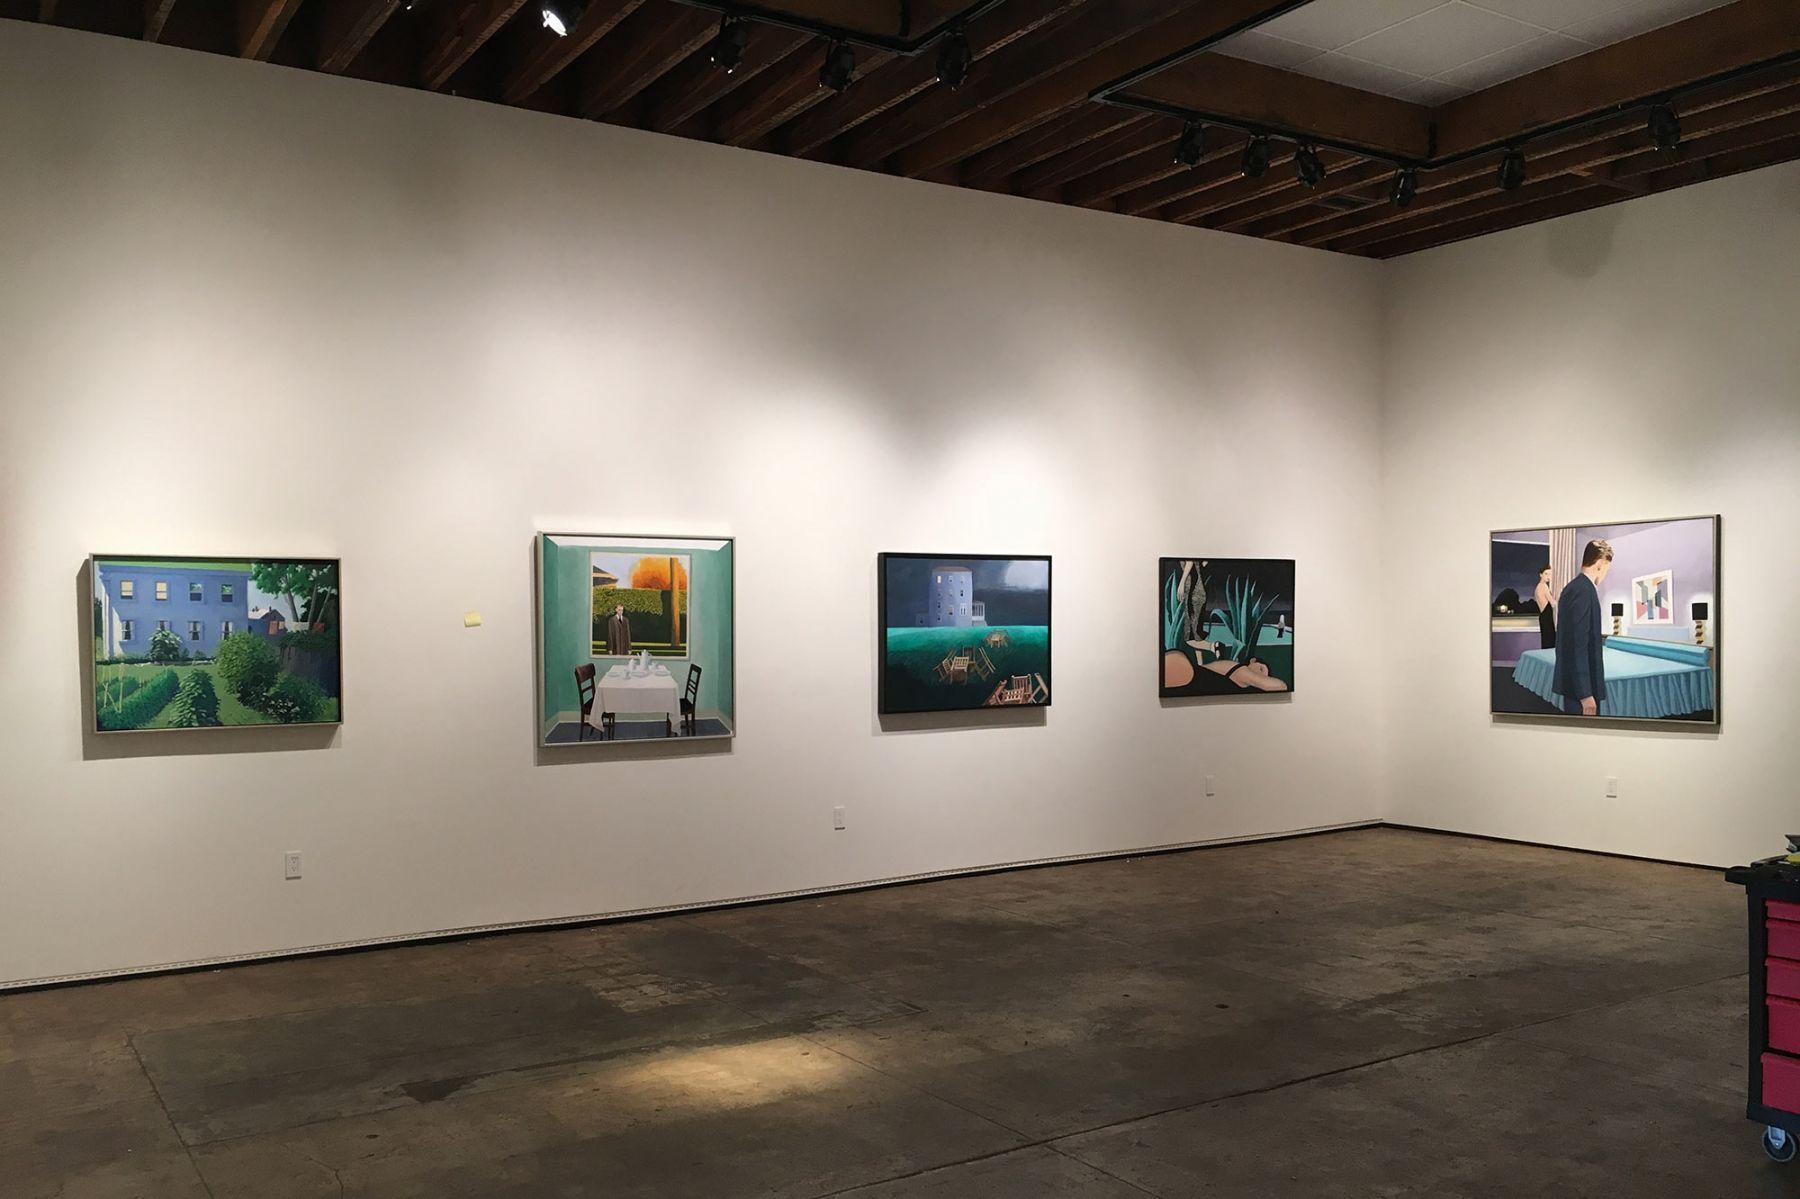 Frank Kirk: The House Across the Street installation photograph